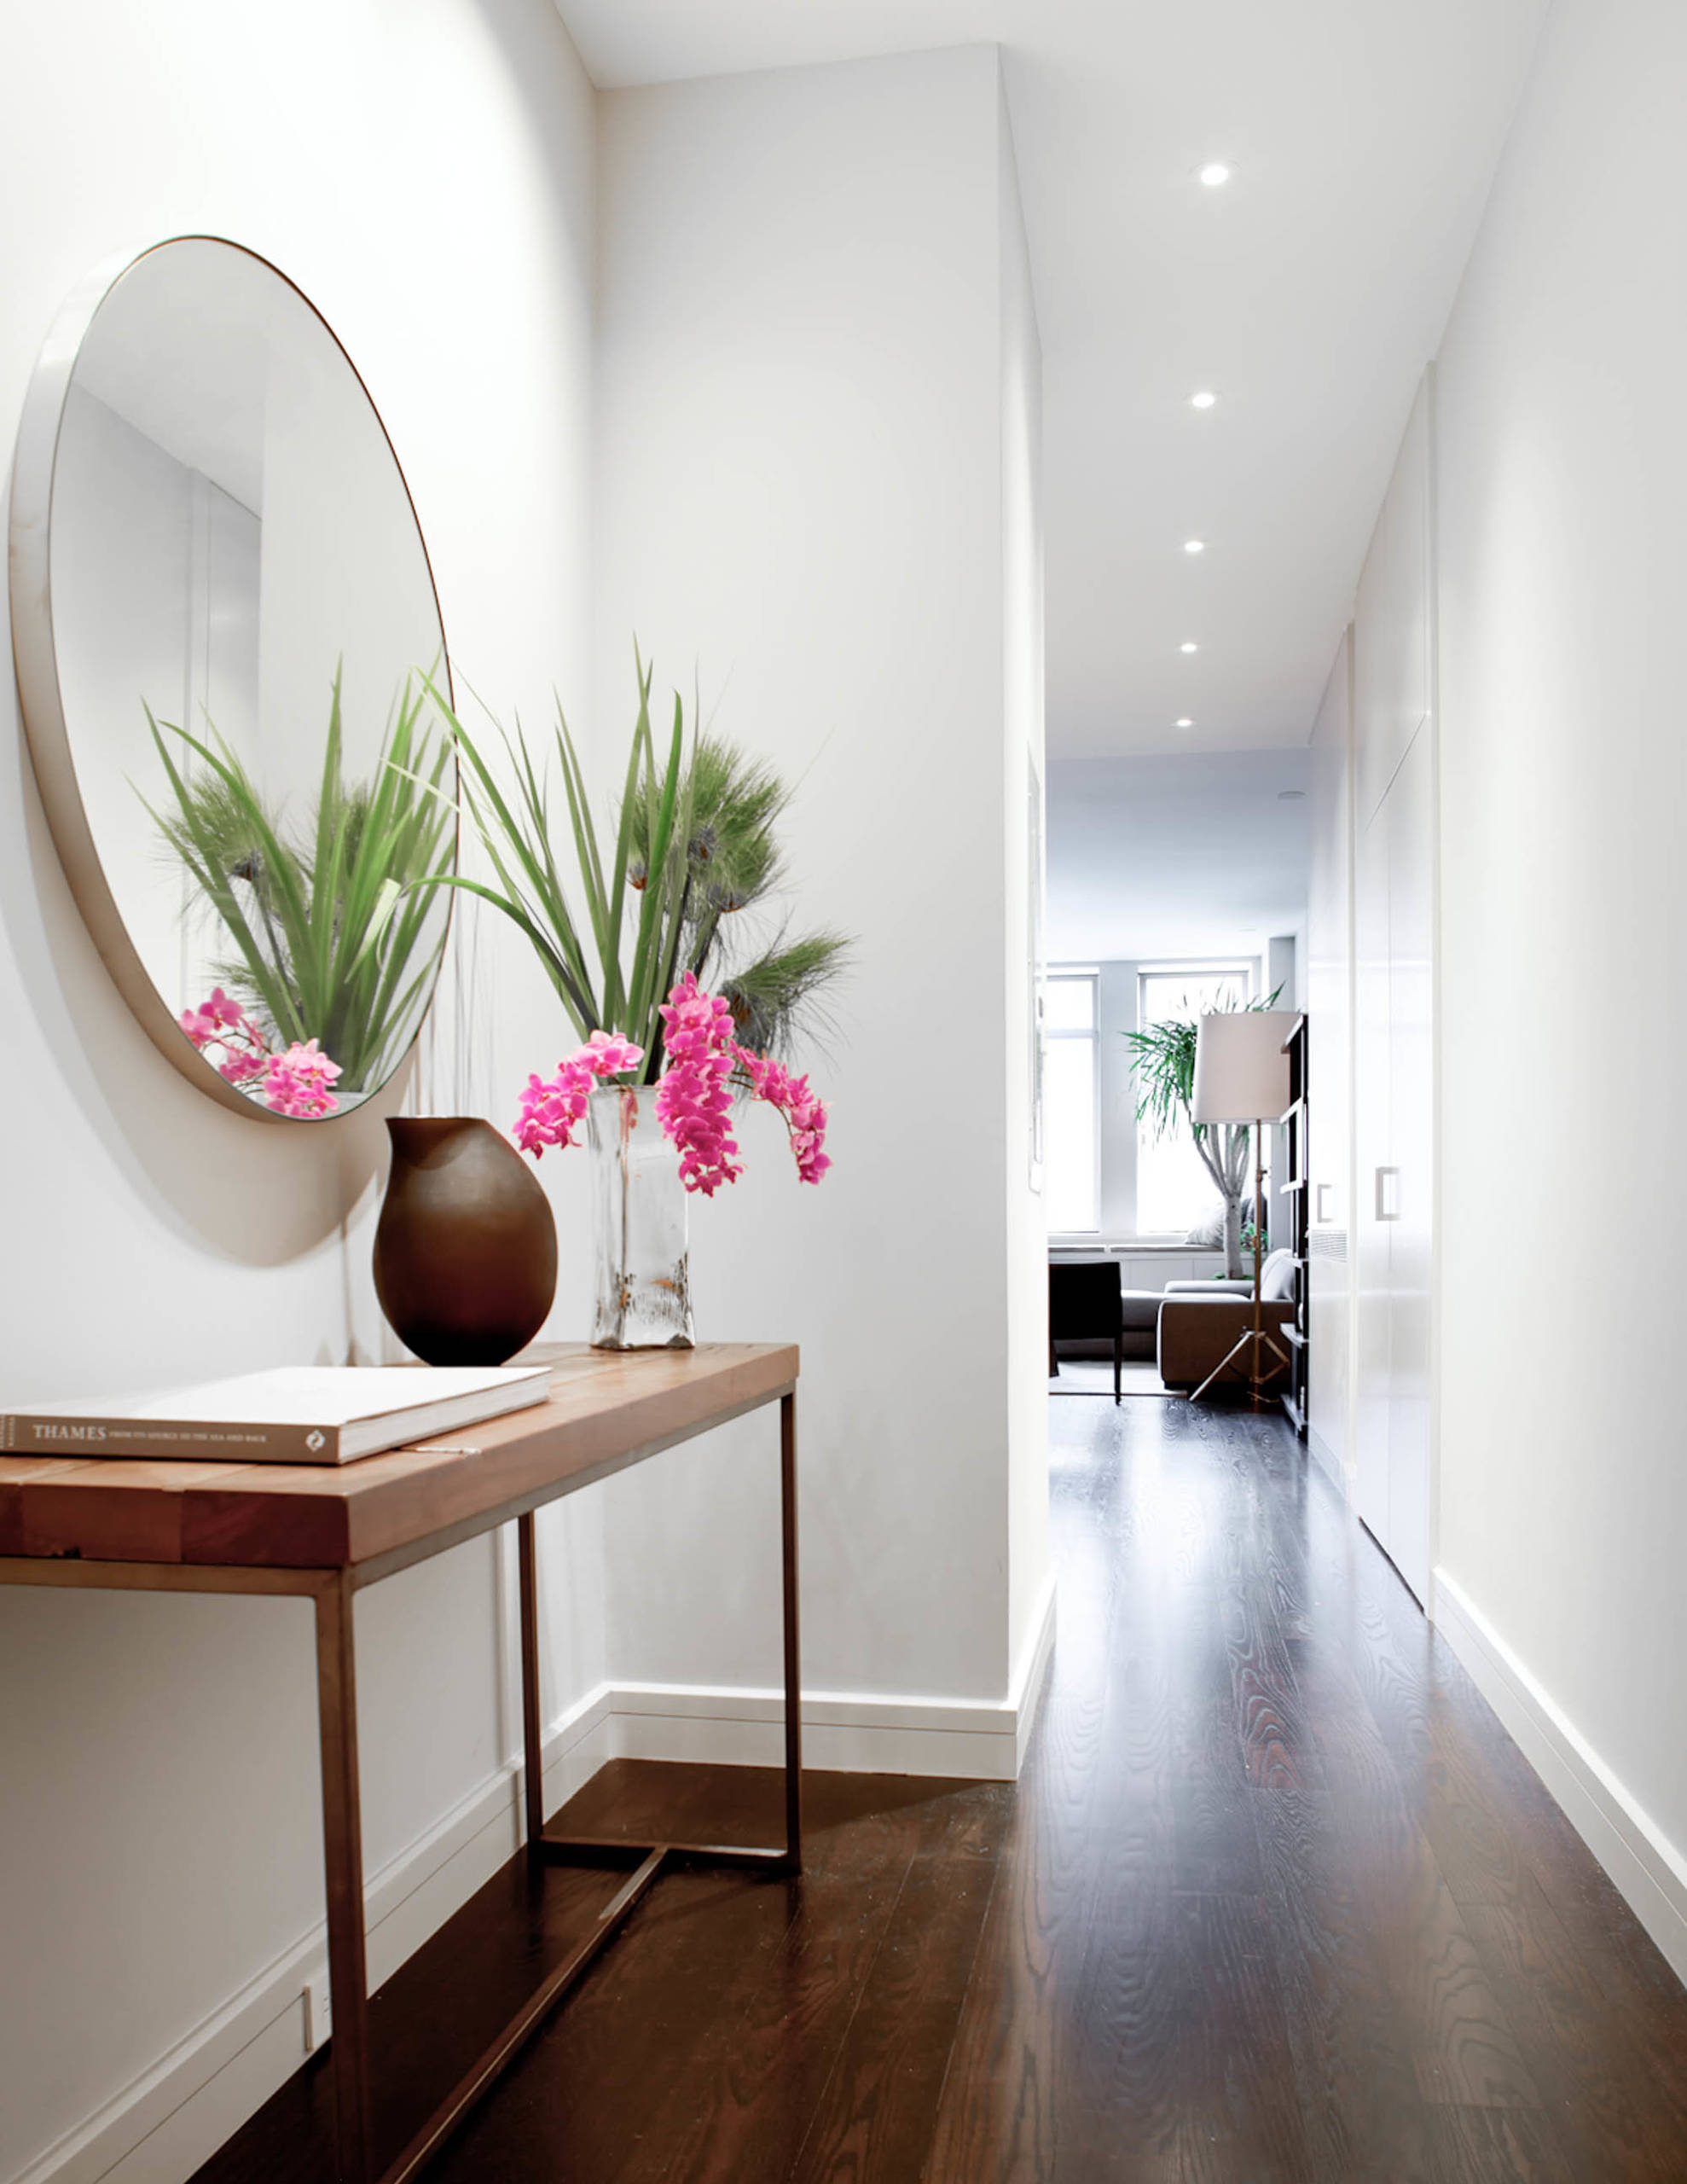 C mo colocar los espejos seg n el feng shui blog de for Espejos feng shui decoracion